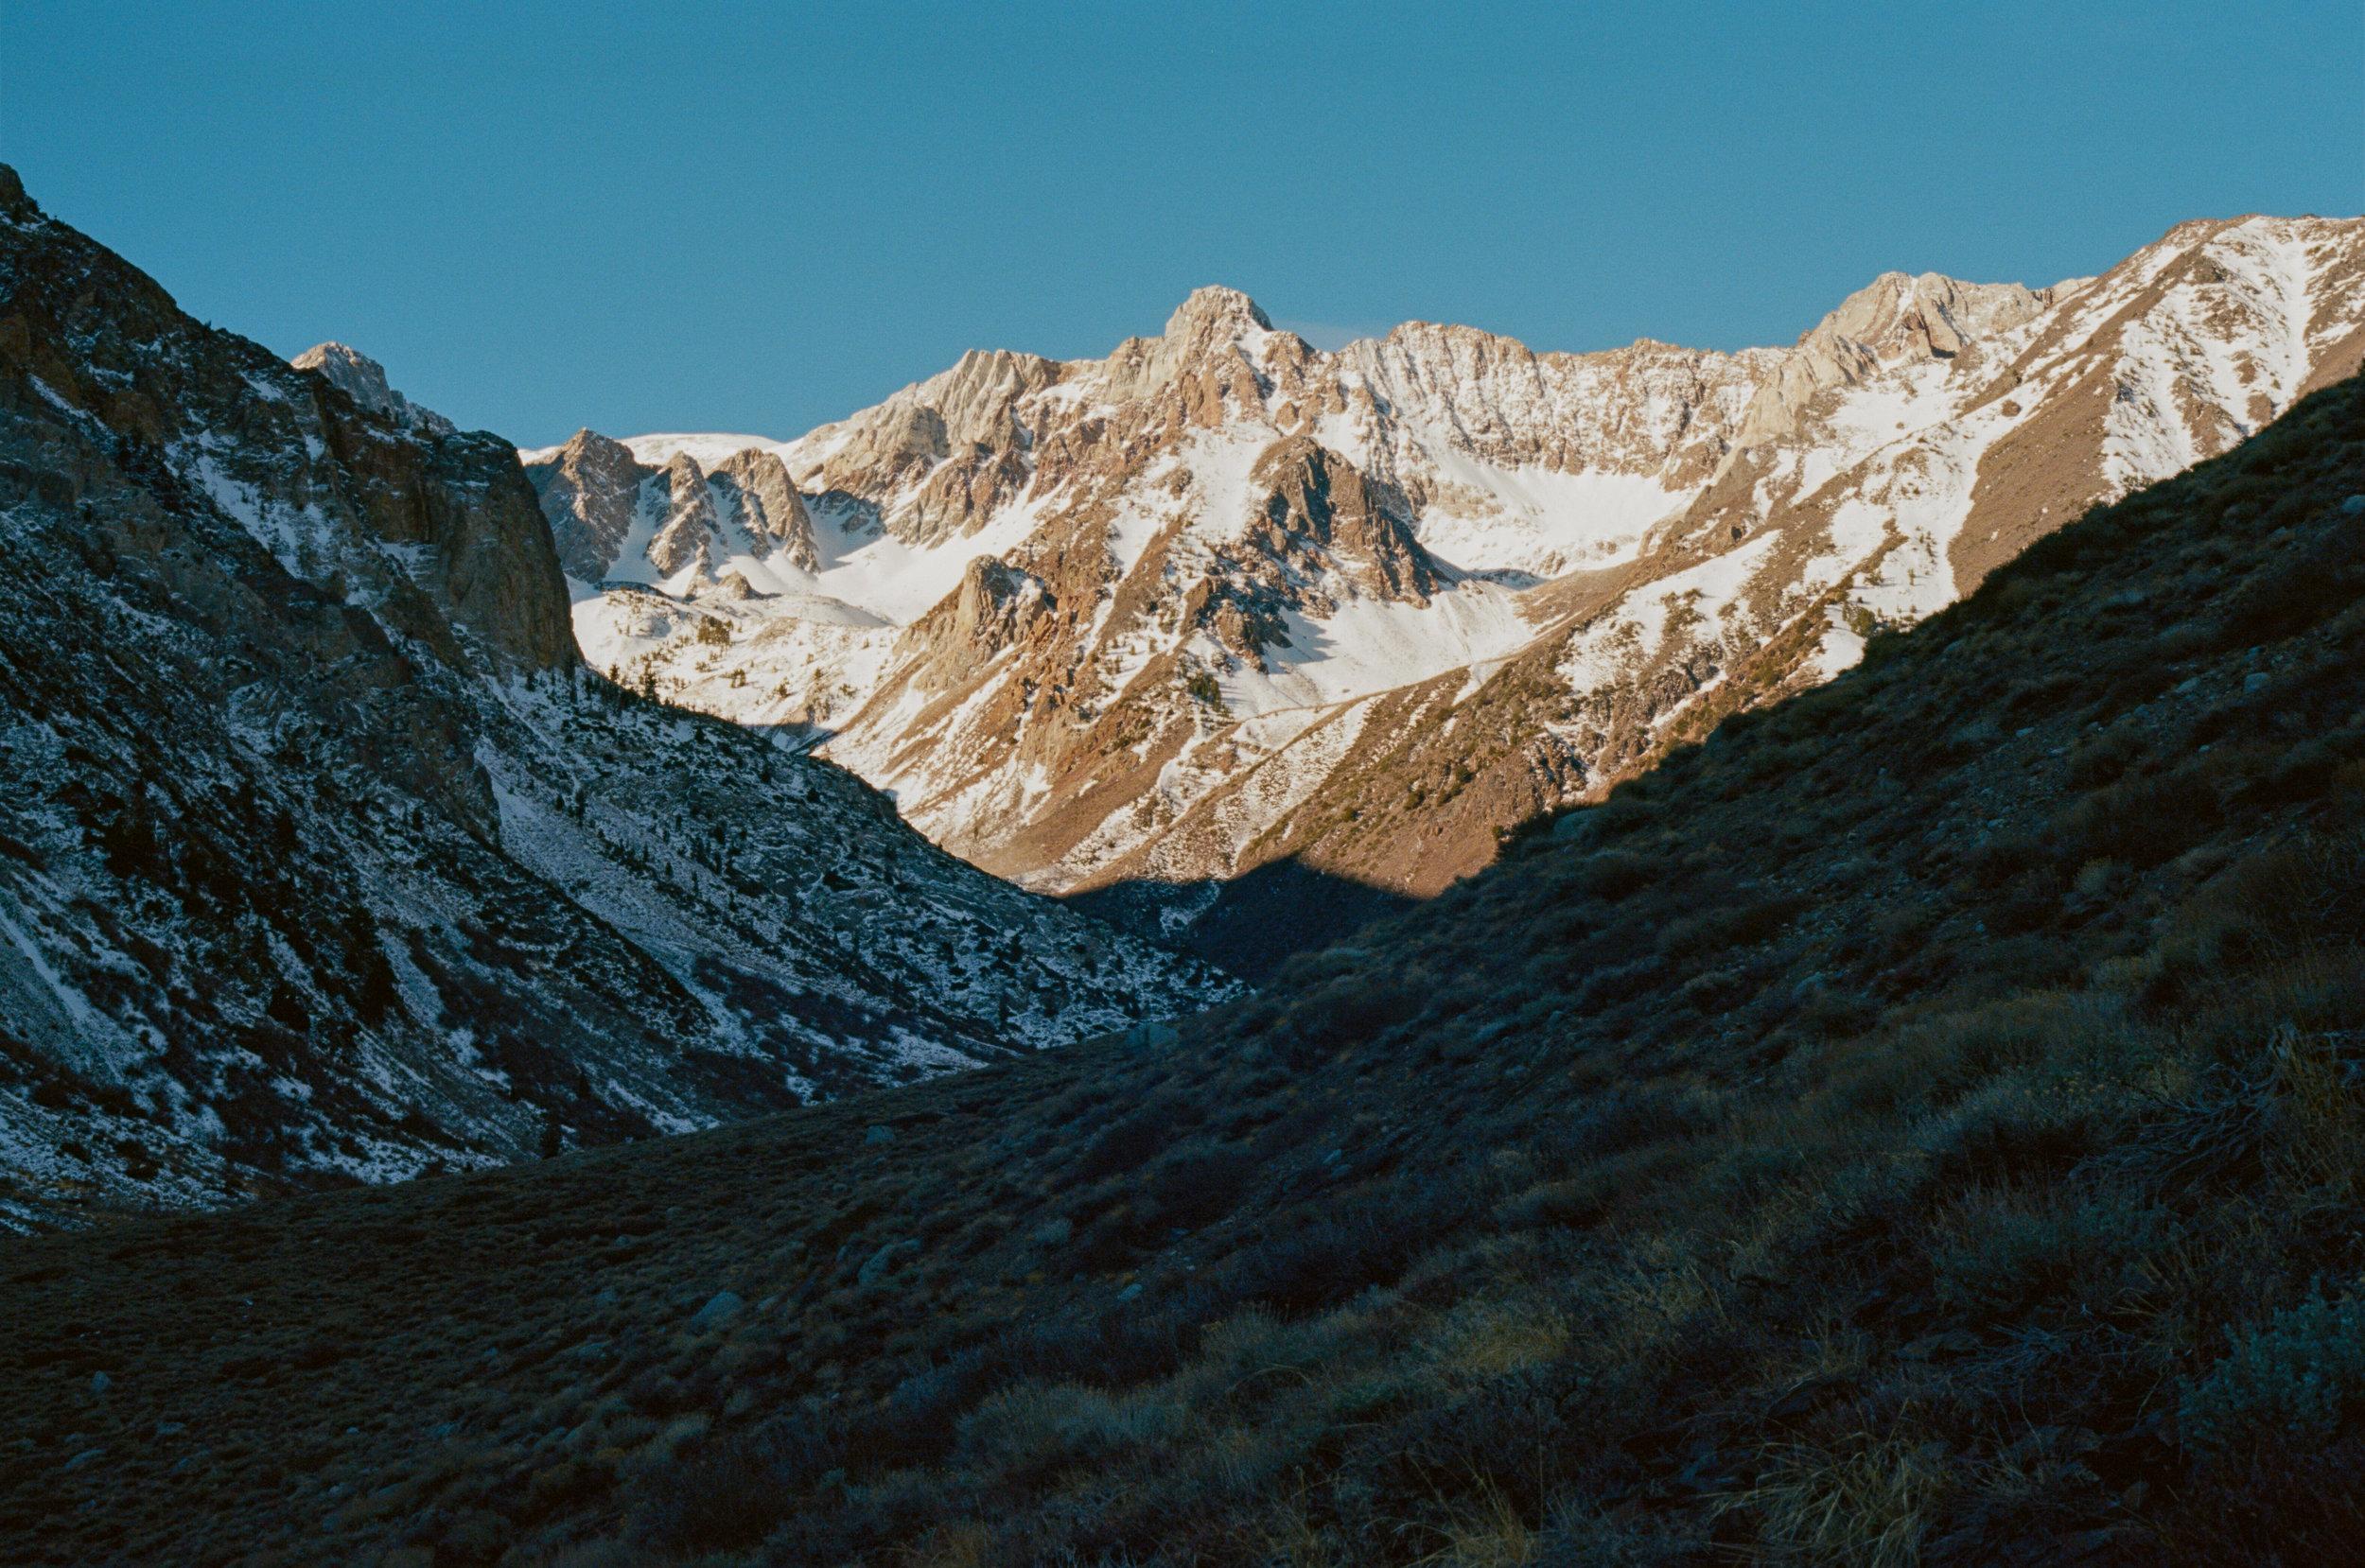 Sierra_MidWinter_Ski-18.jpg